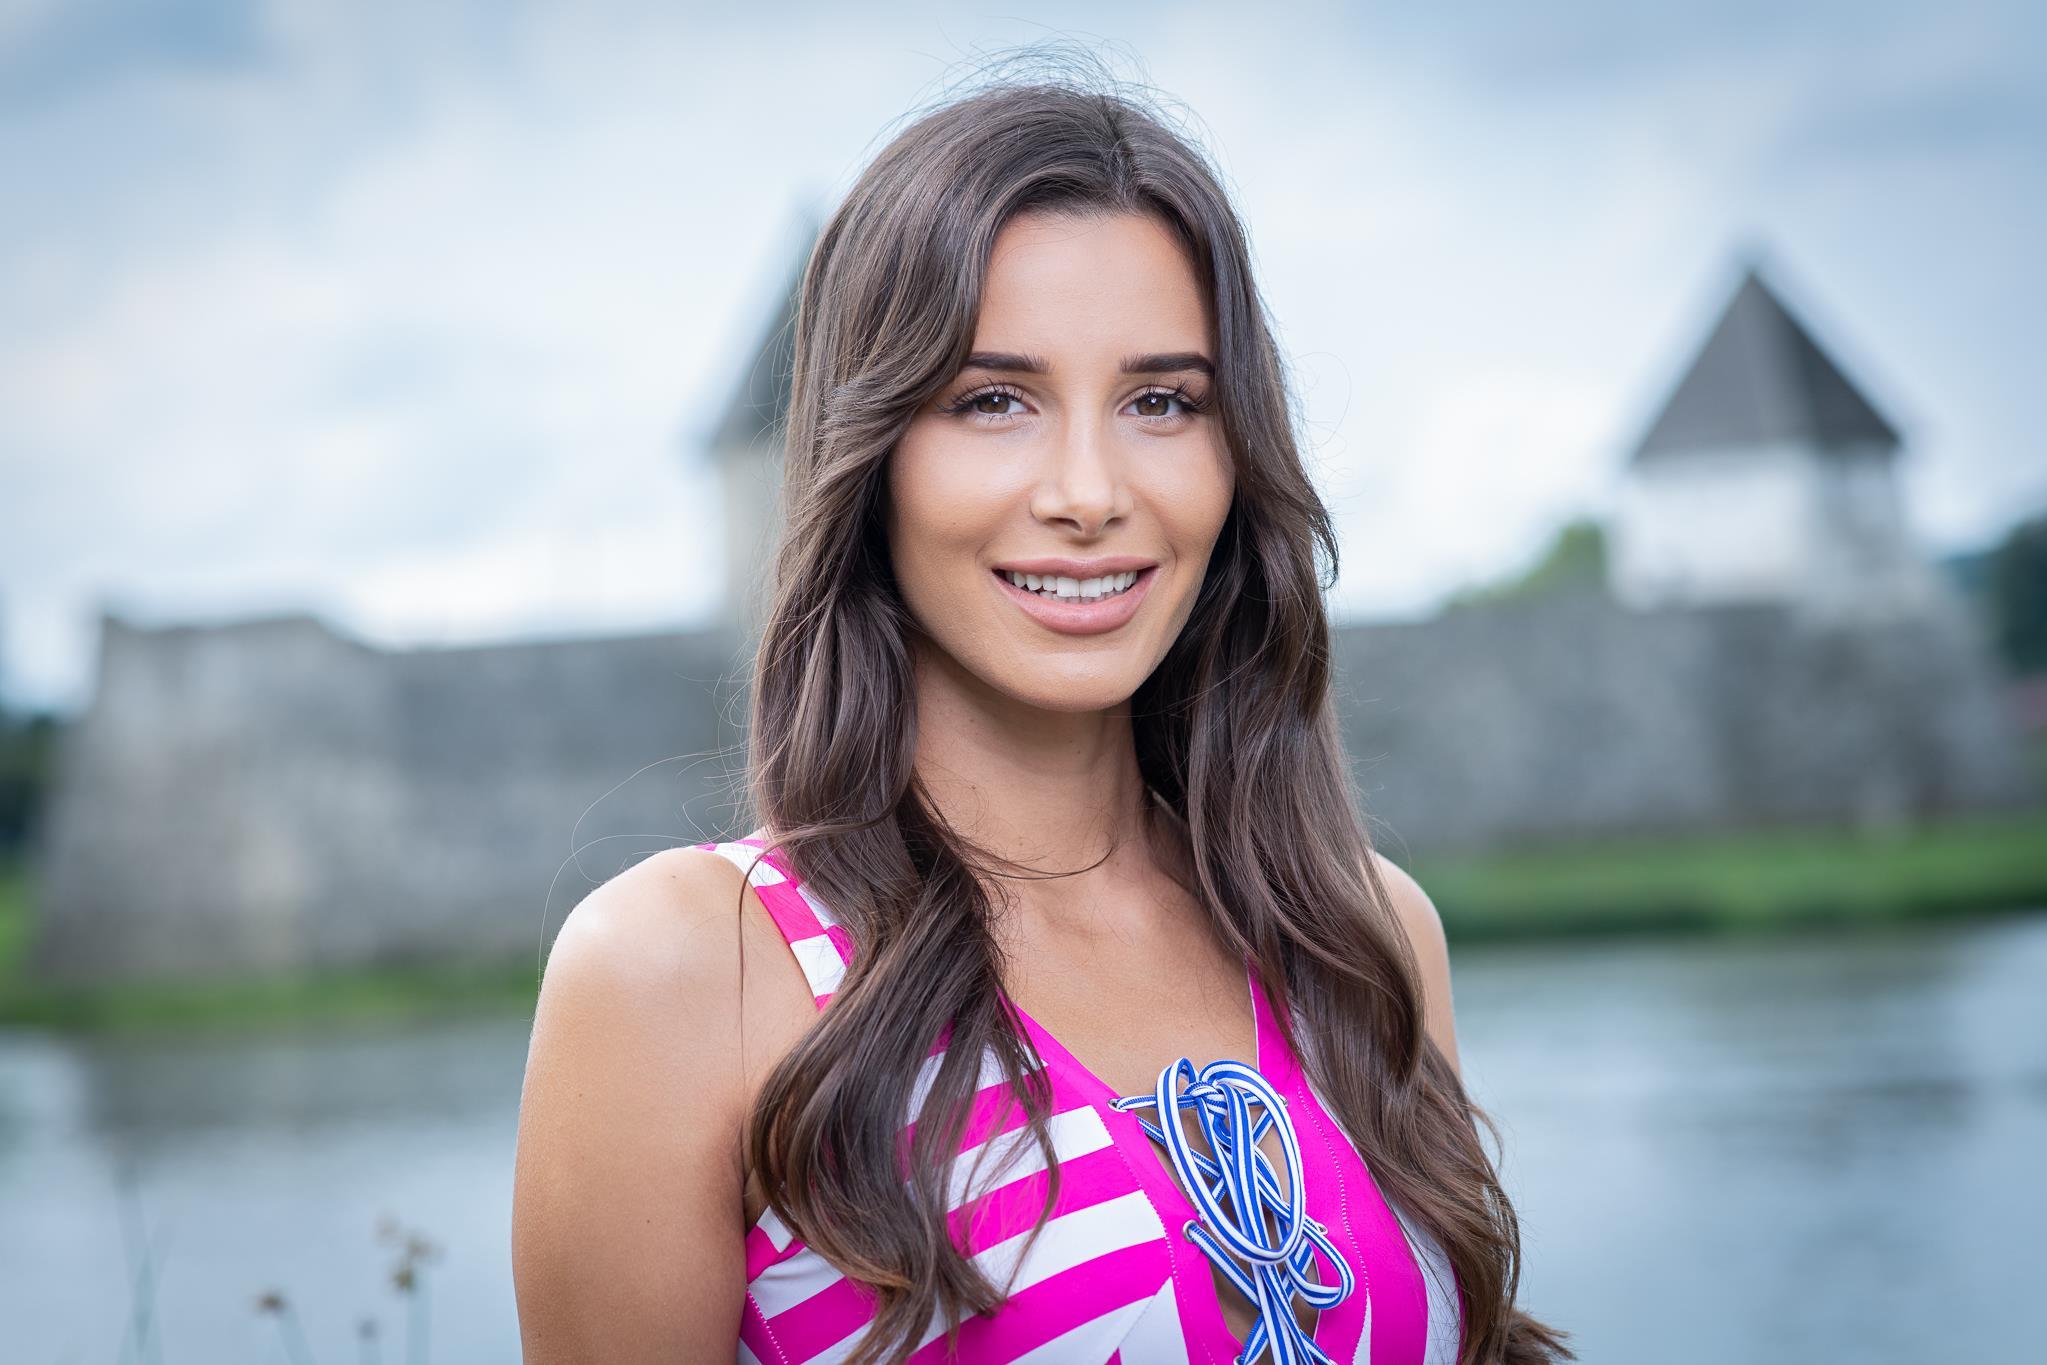 Katarina Mamić (CROATIA 2019) Lrg_46762966__DSC5752